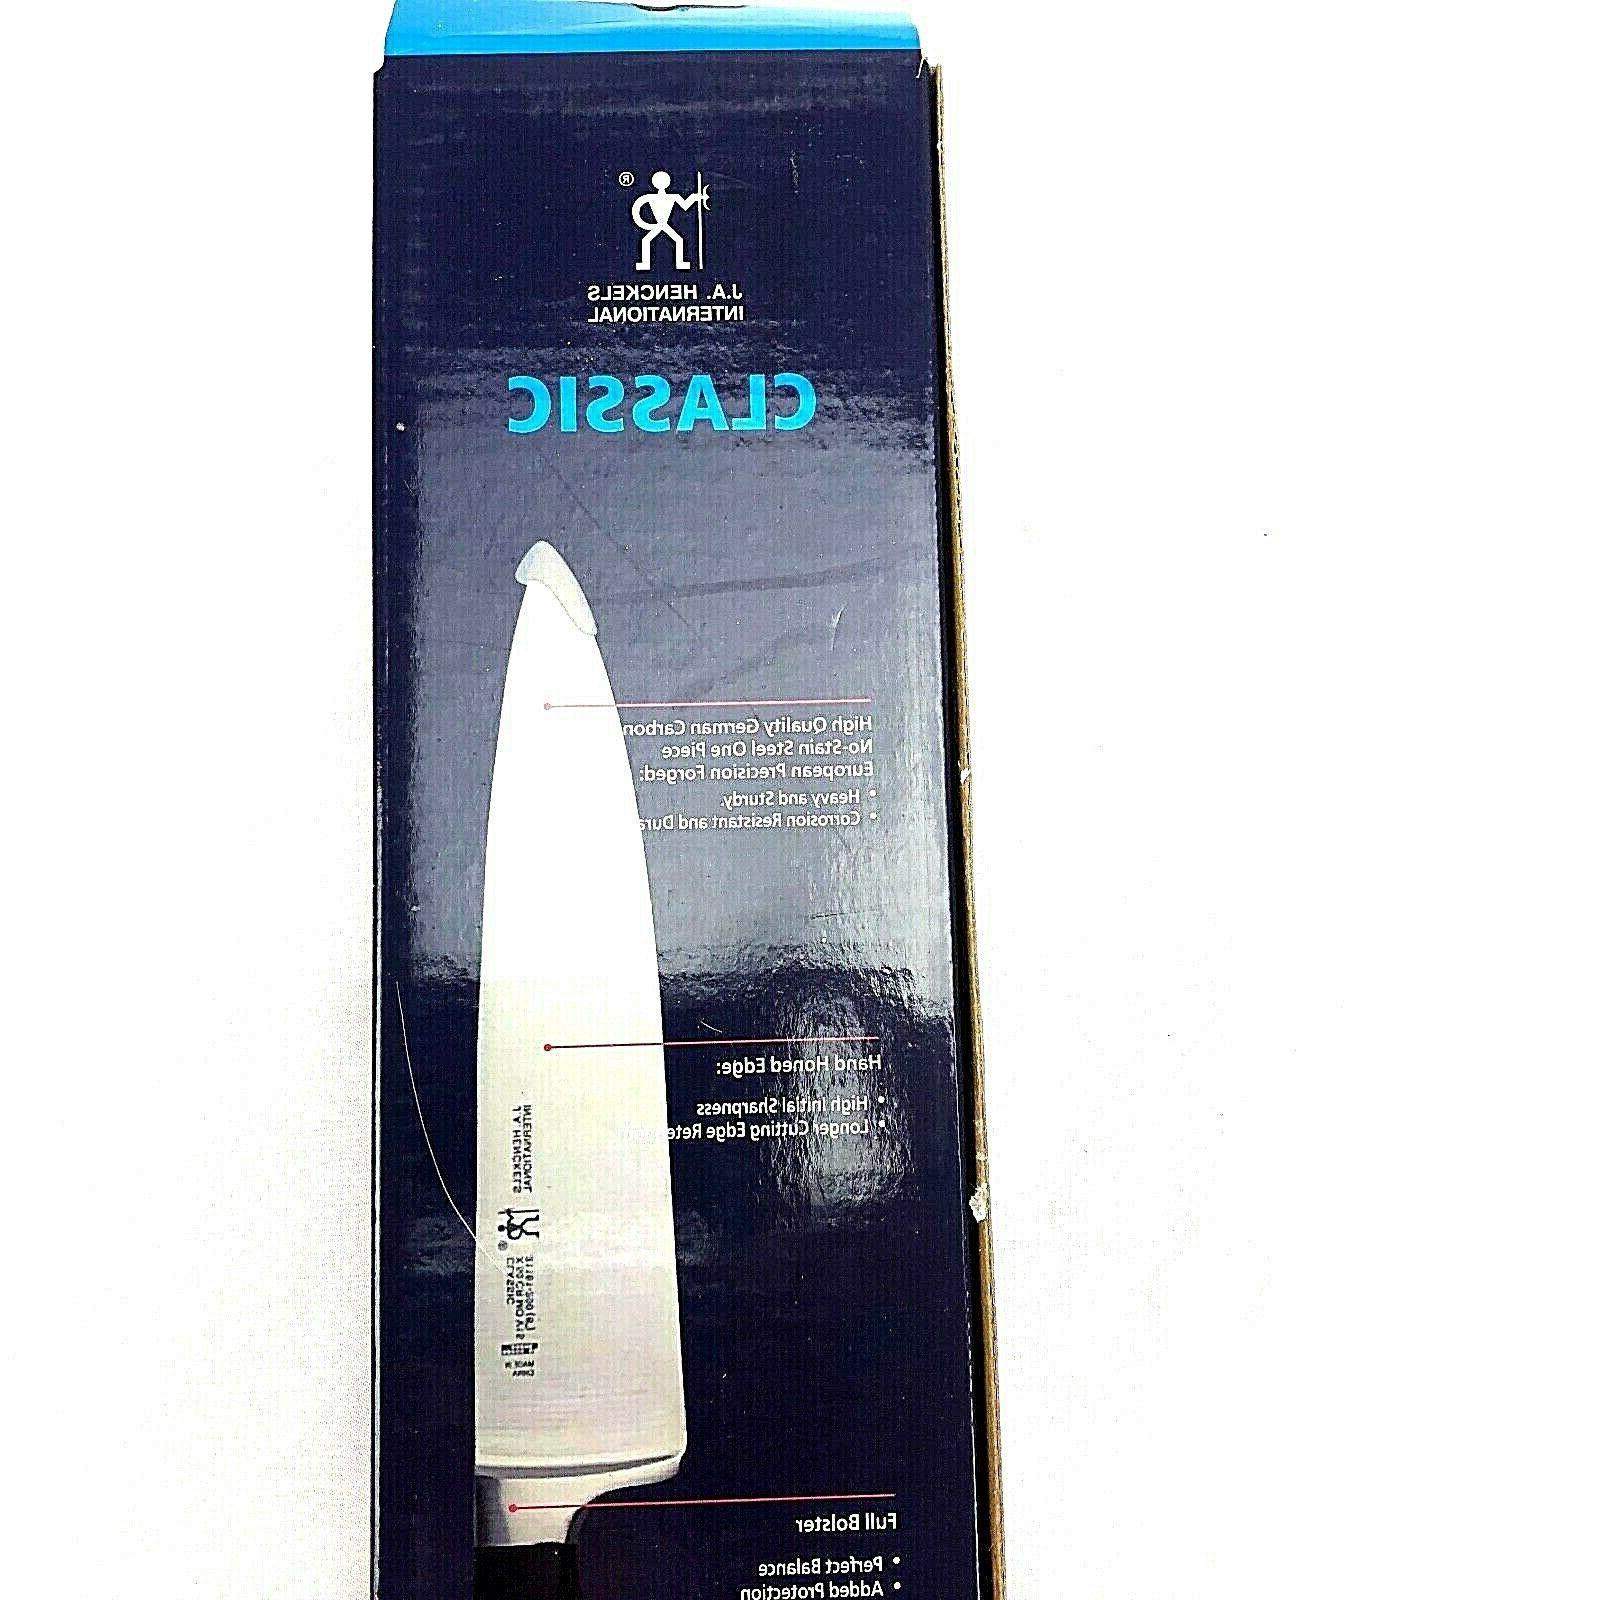 J.A. Henckels Inch Classic Chef's NIB 31161-200